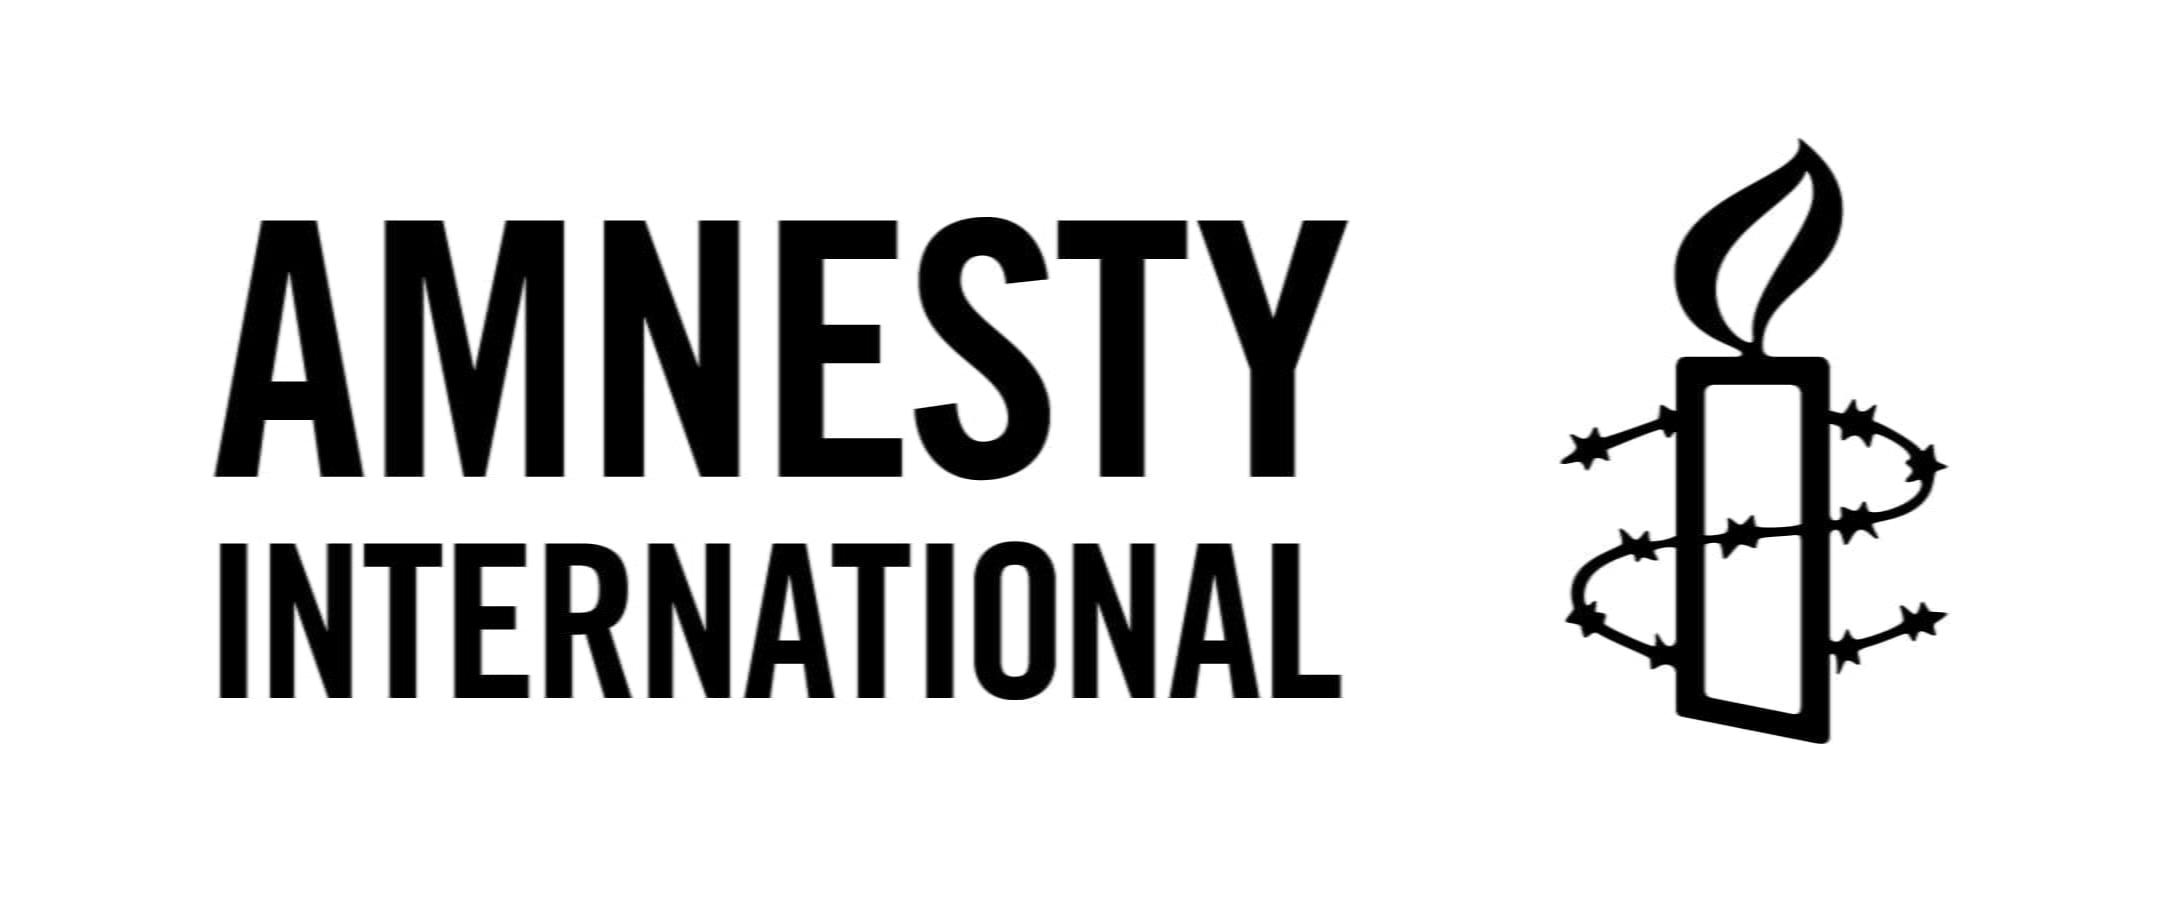 Branding and logos for activists - Amnesty International Australia